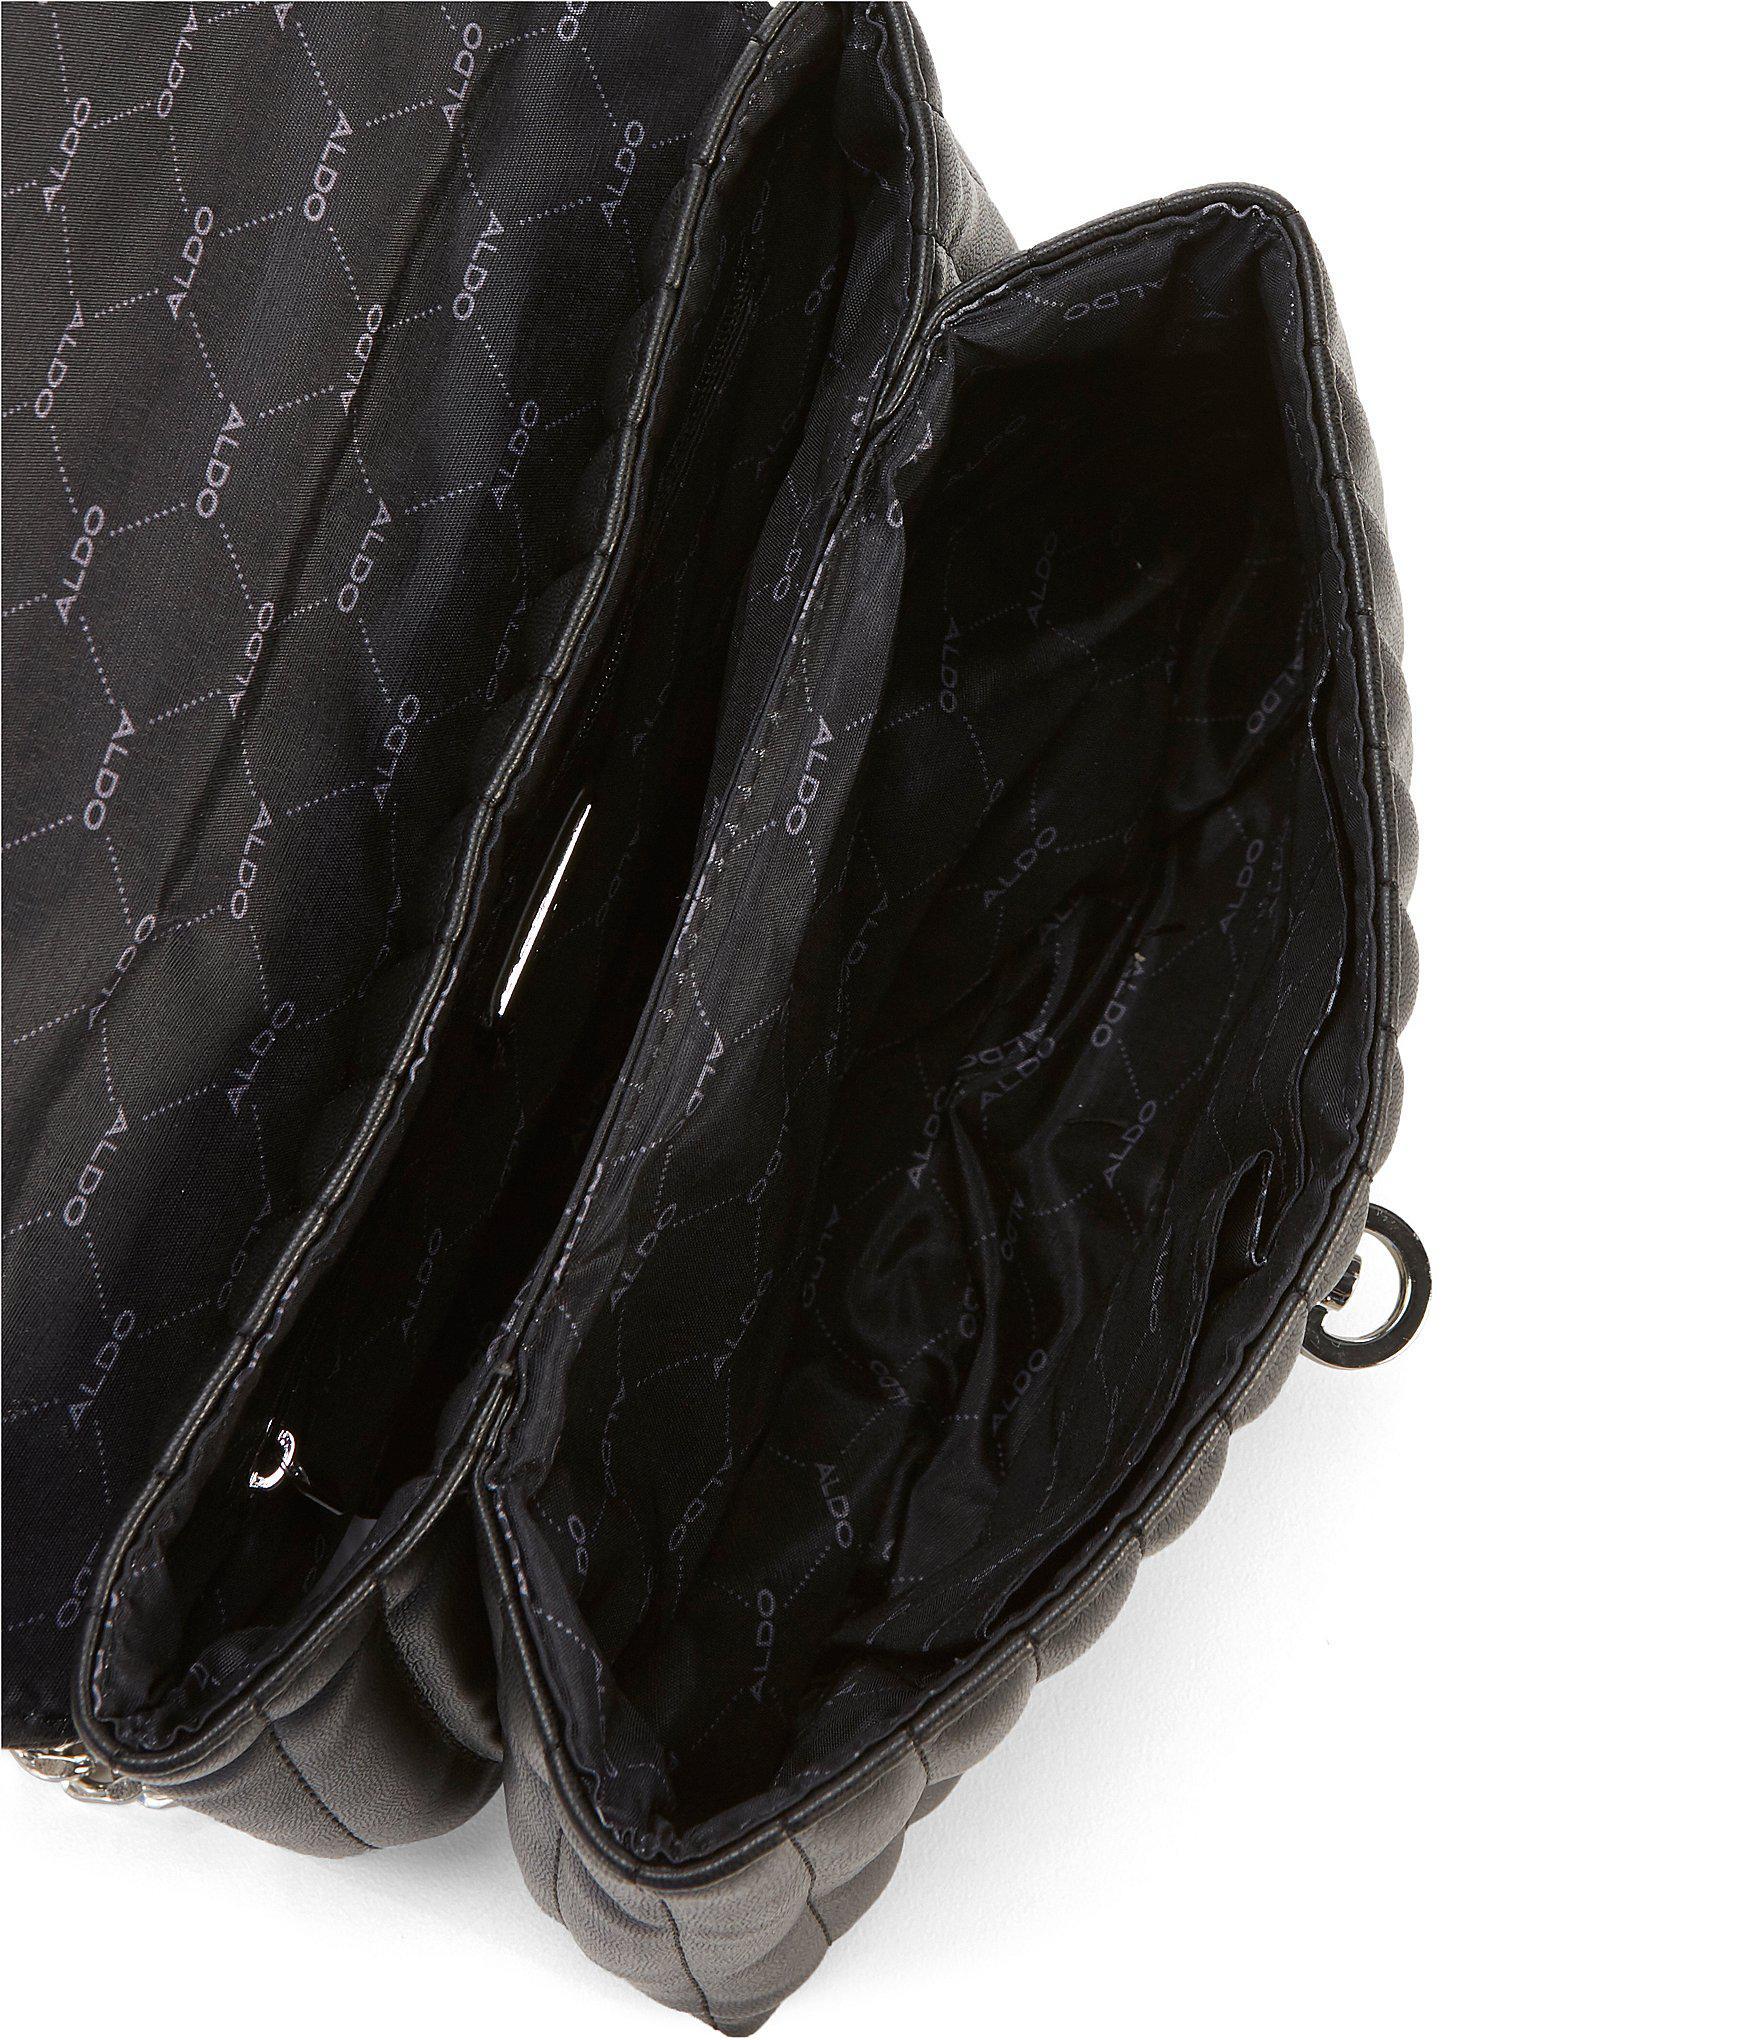 b0de47c6307 Lyst - ALDO Abilaniel Quilted Chain Strap Clutch in Black